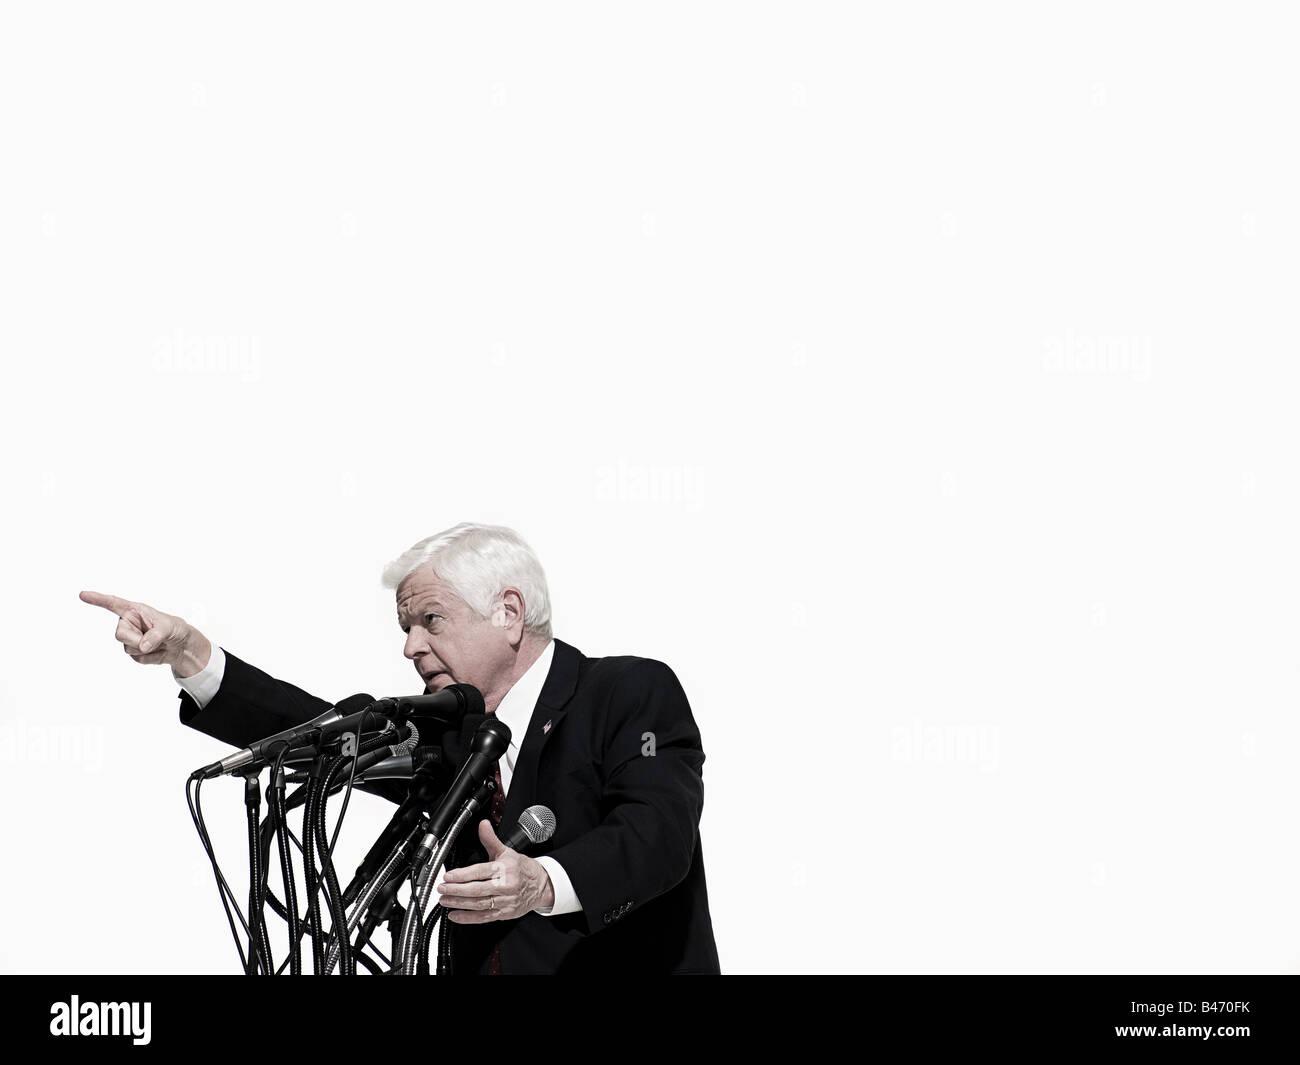 Politician giving speech - Stock Image